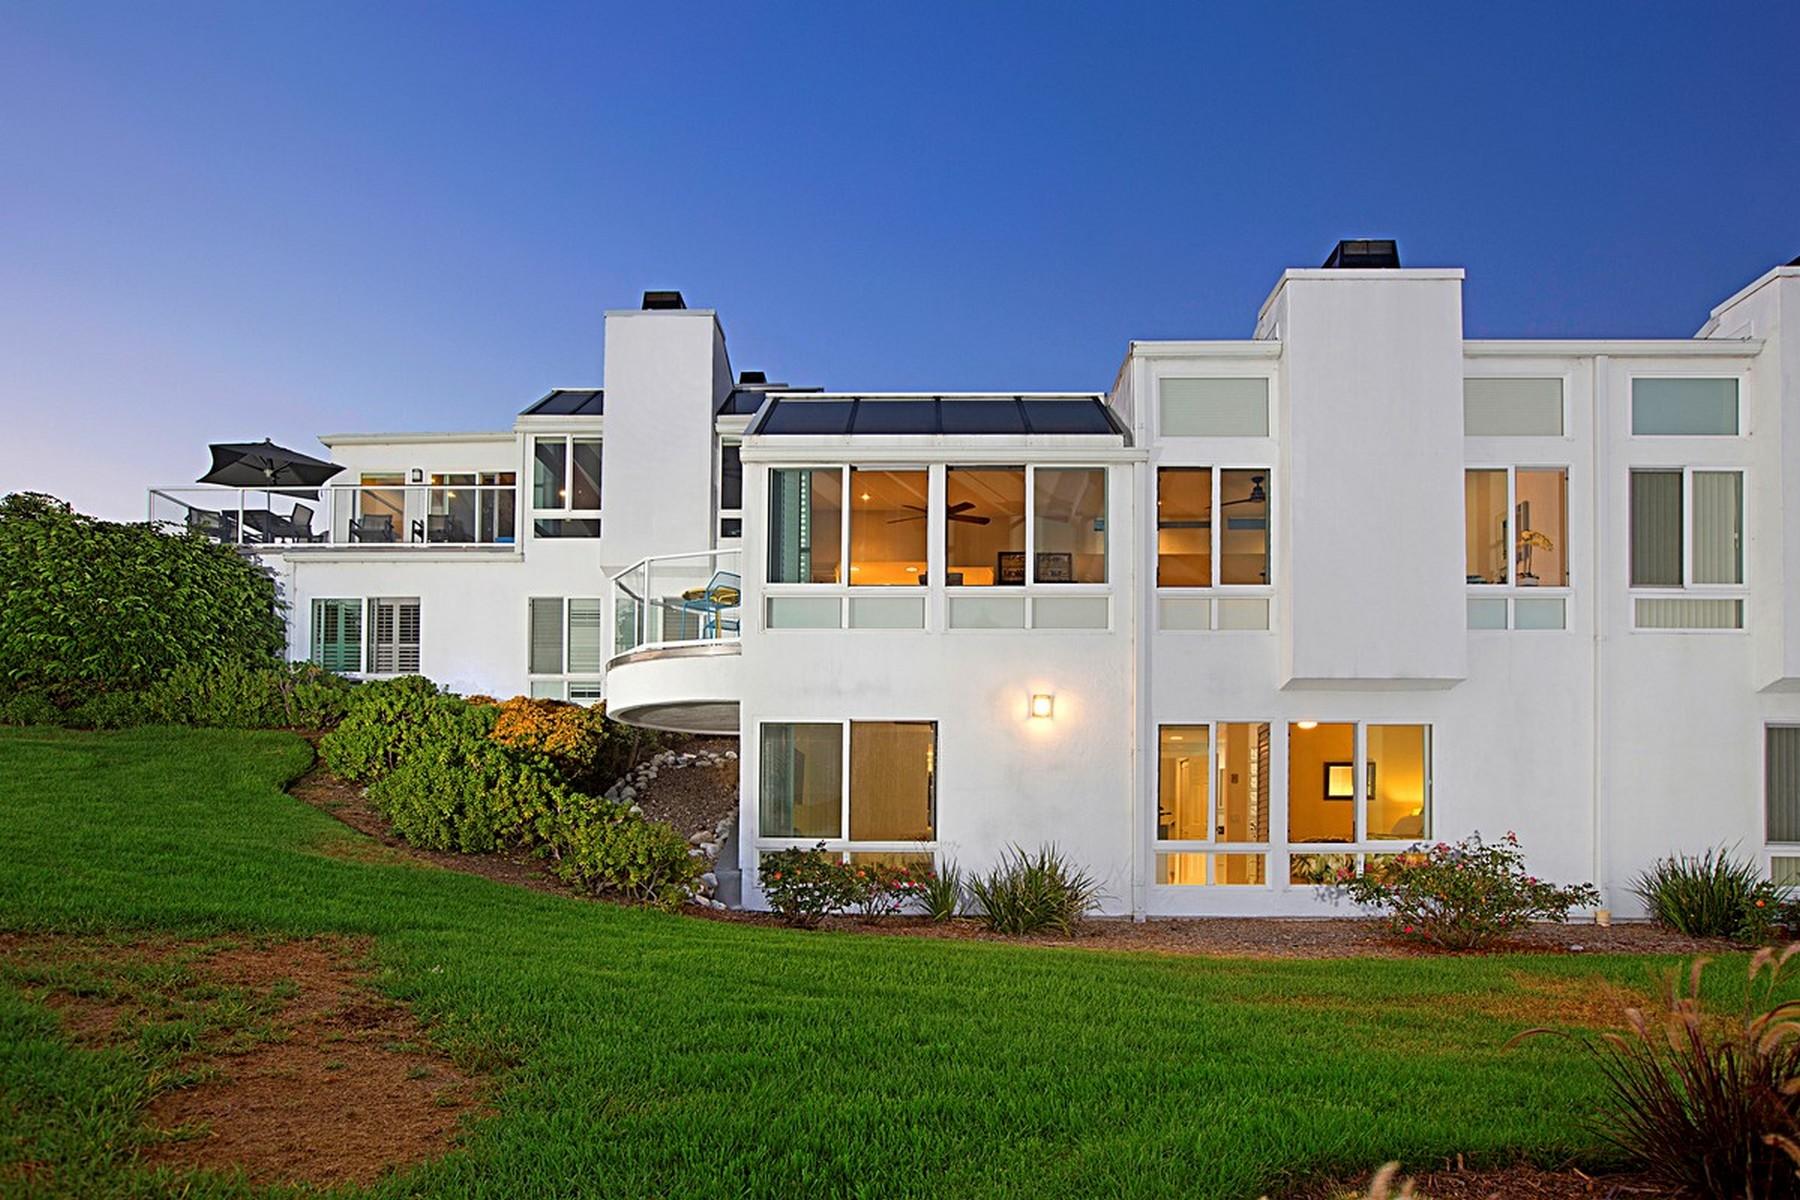 Condominium for Sale at 332 Shoemaker Court Solana Beach, California, 92075 United States